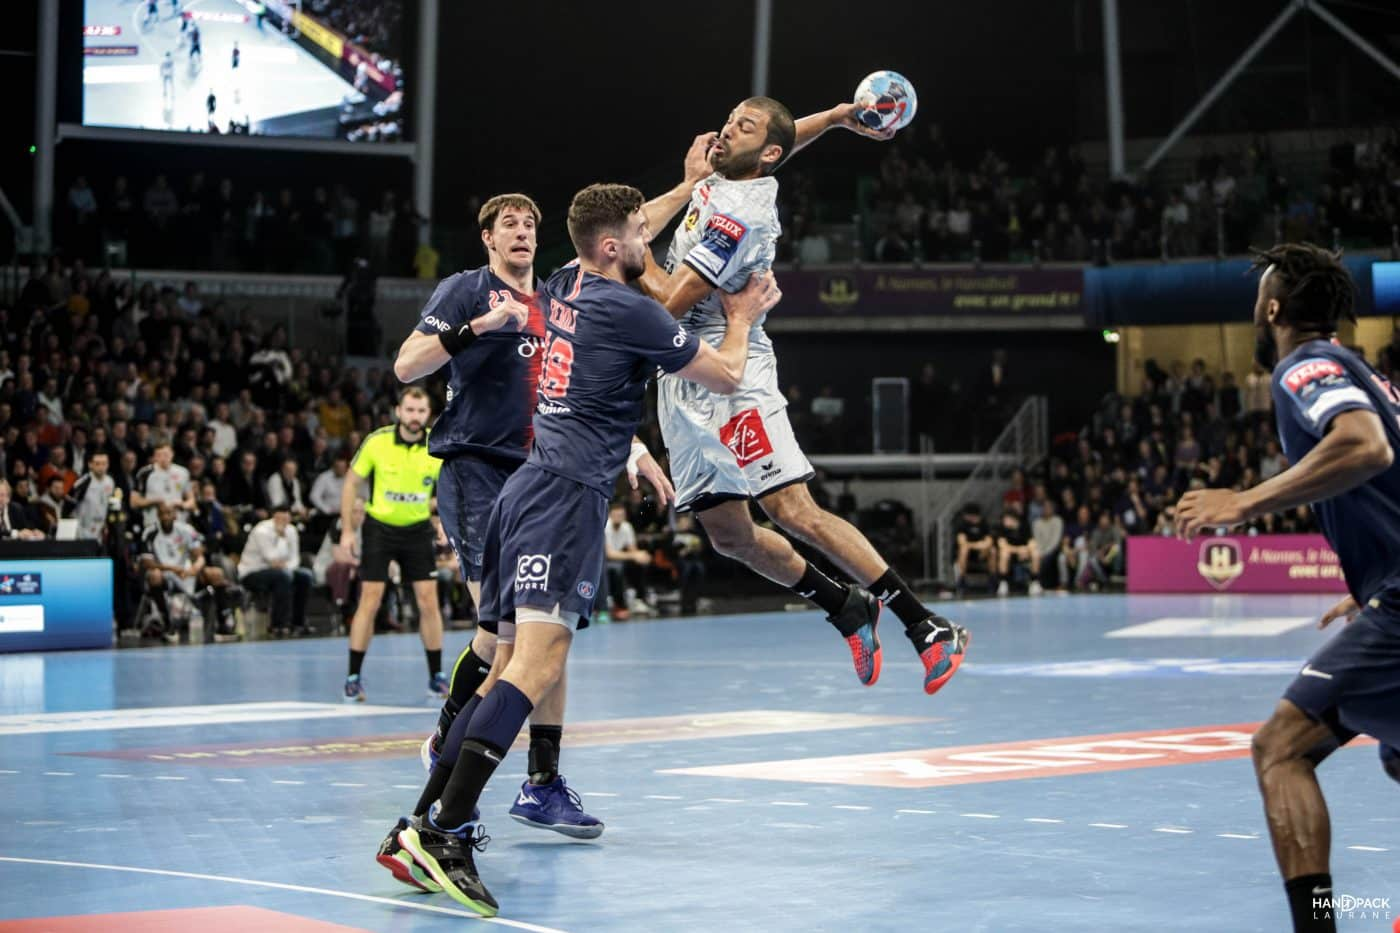 hbc-nantes-paris-saint-germain-handball-ligue-des-champions-2019-handpack-10